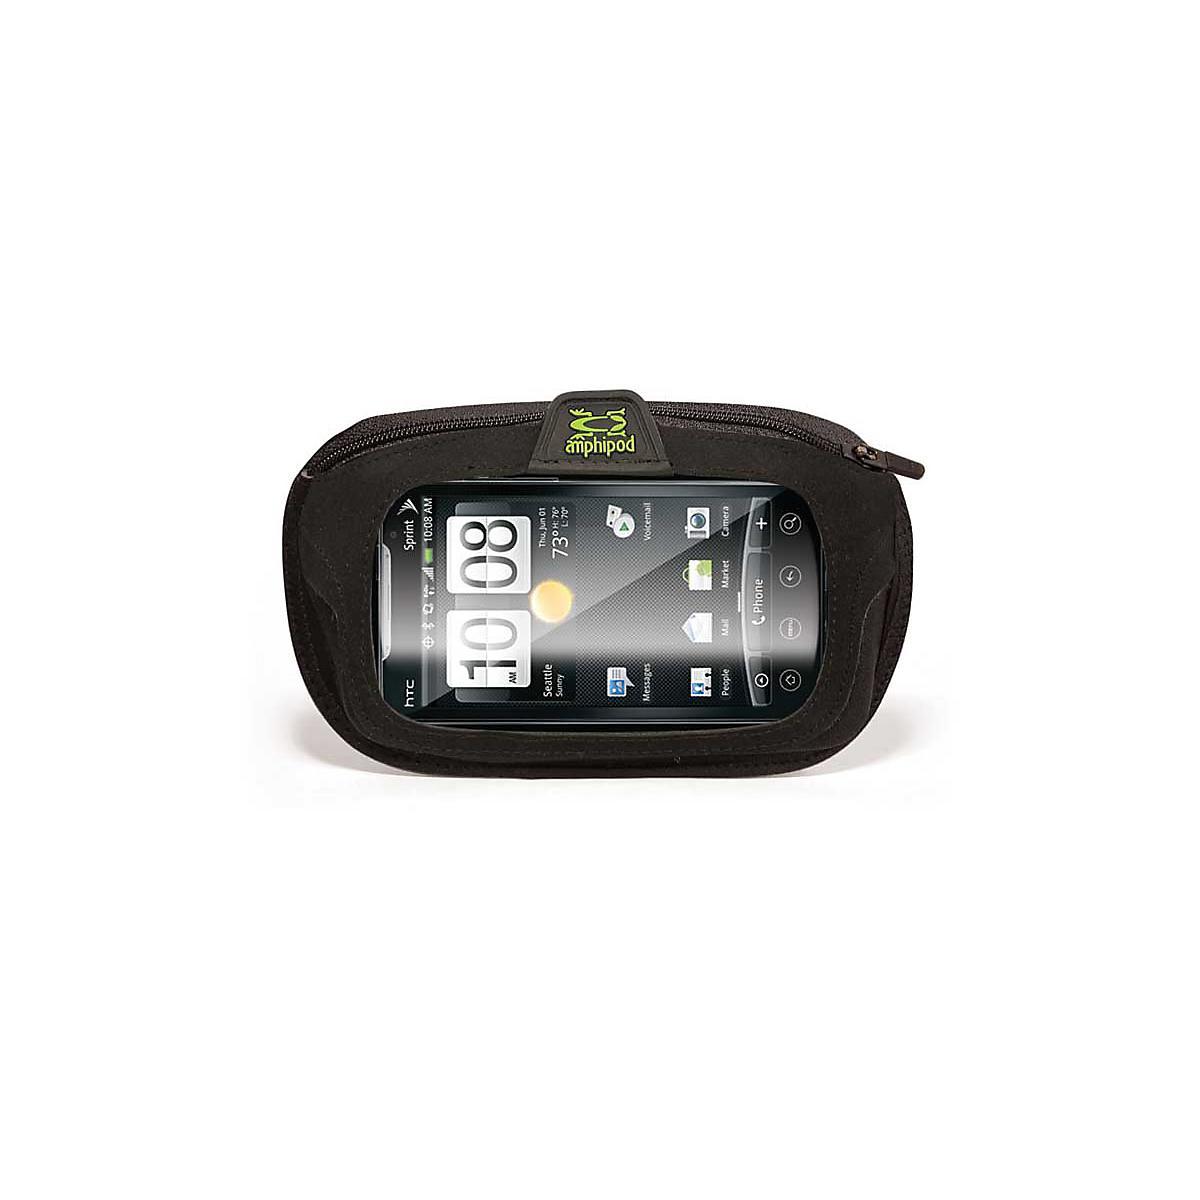 Amphipod�Micropack SmartView Plus